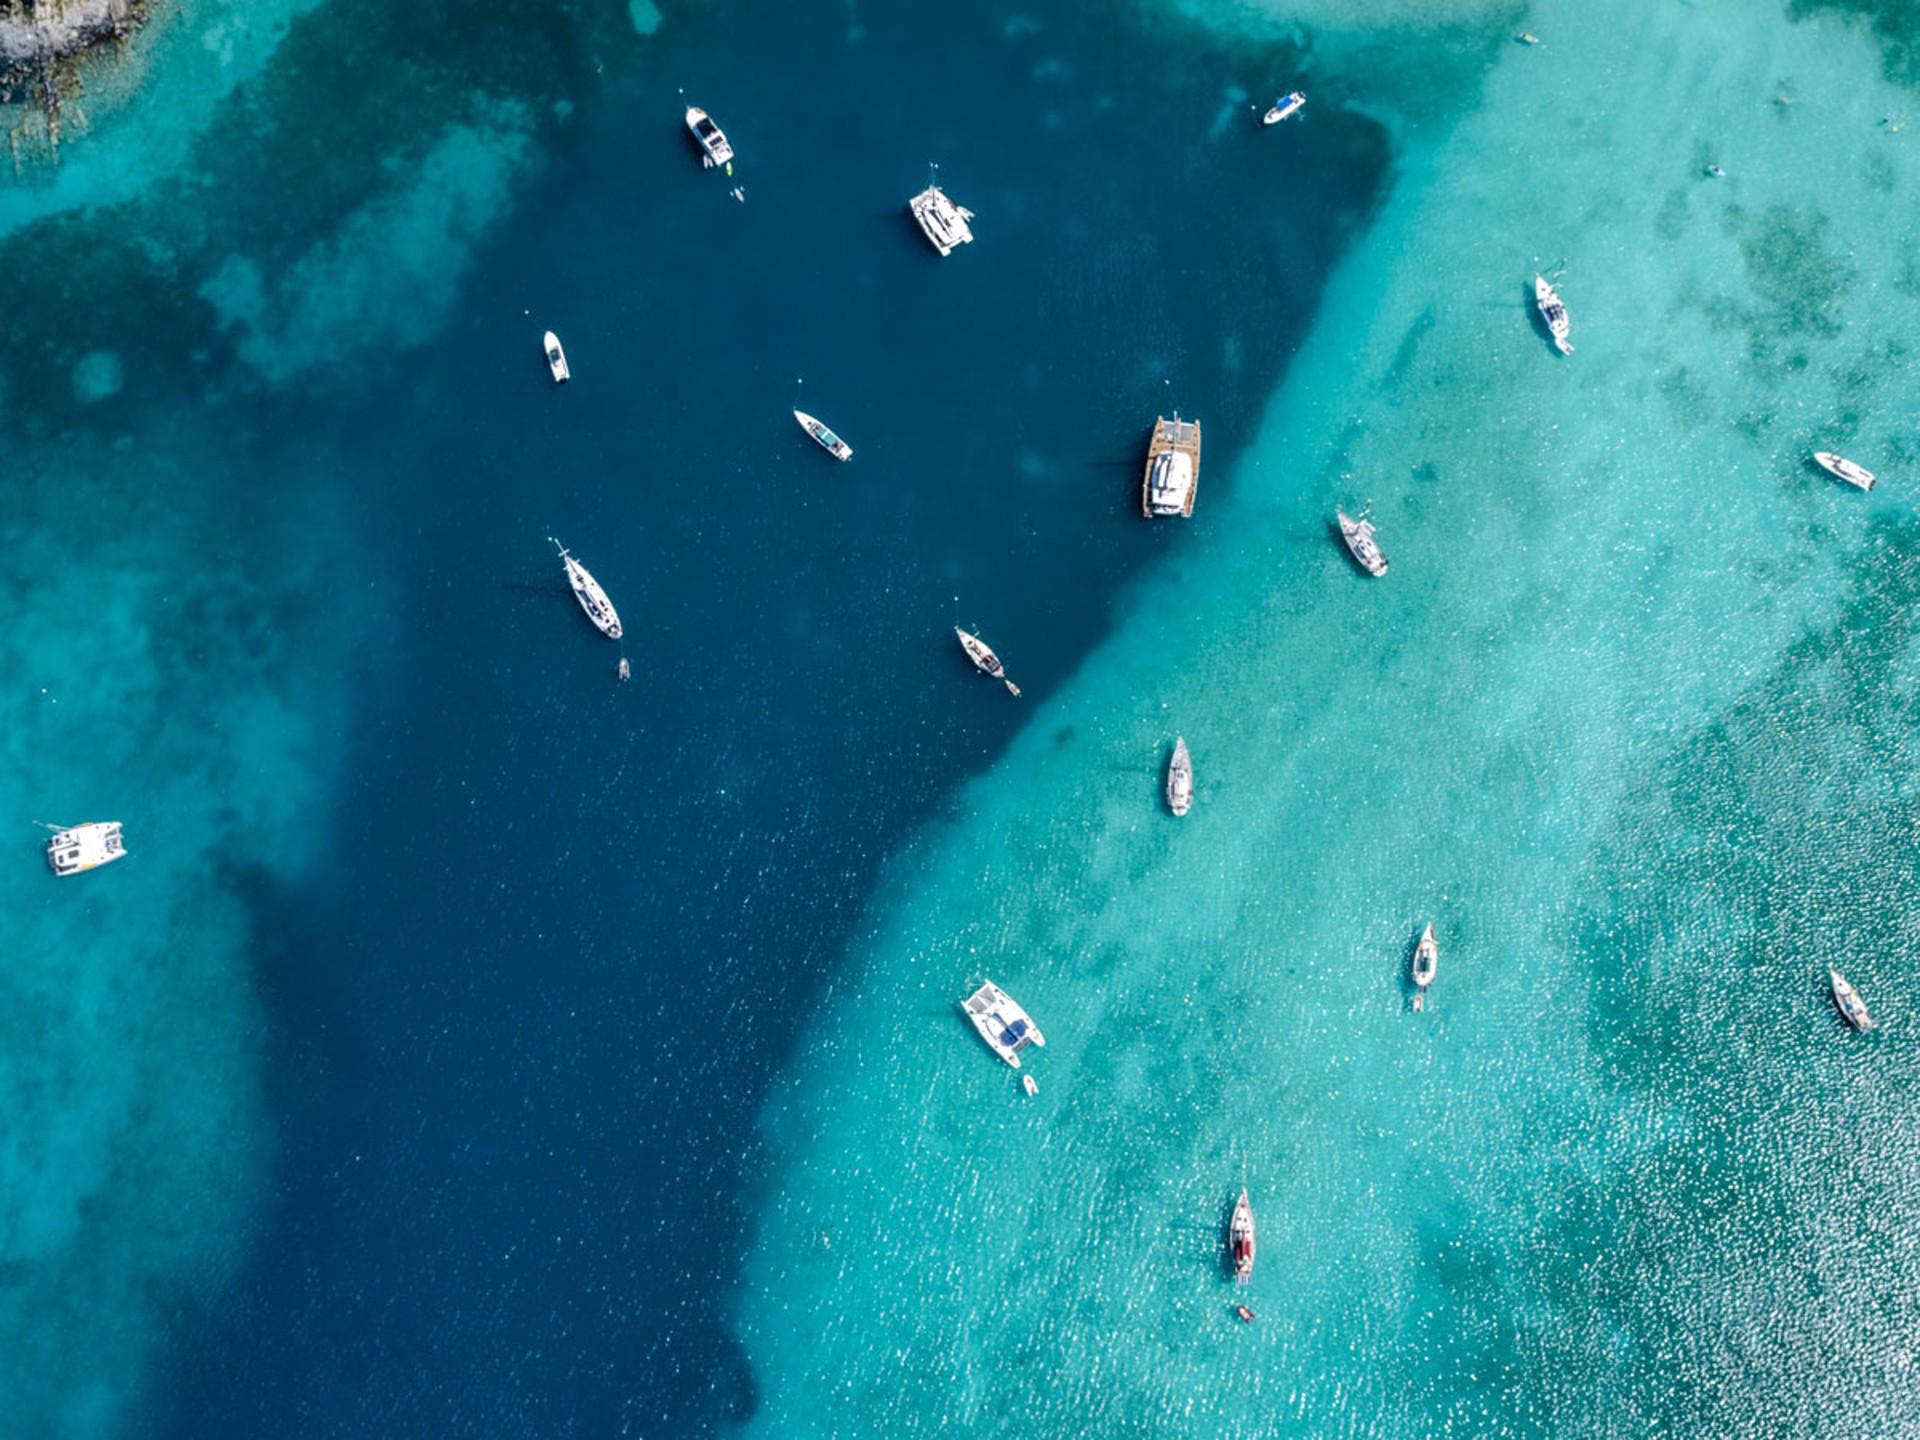 Anchored,  Van Dyke, British Virgin Islands by Dinesh Boaz